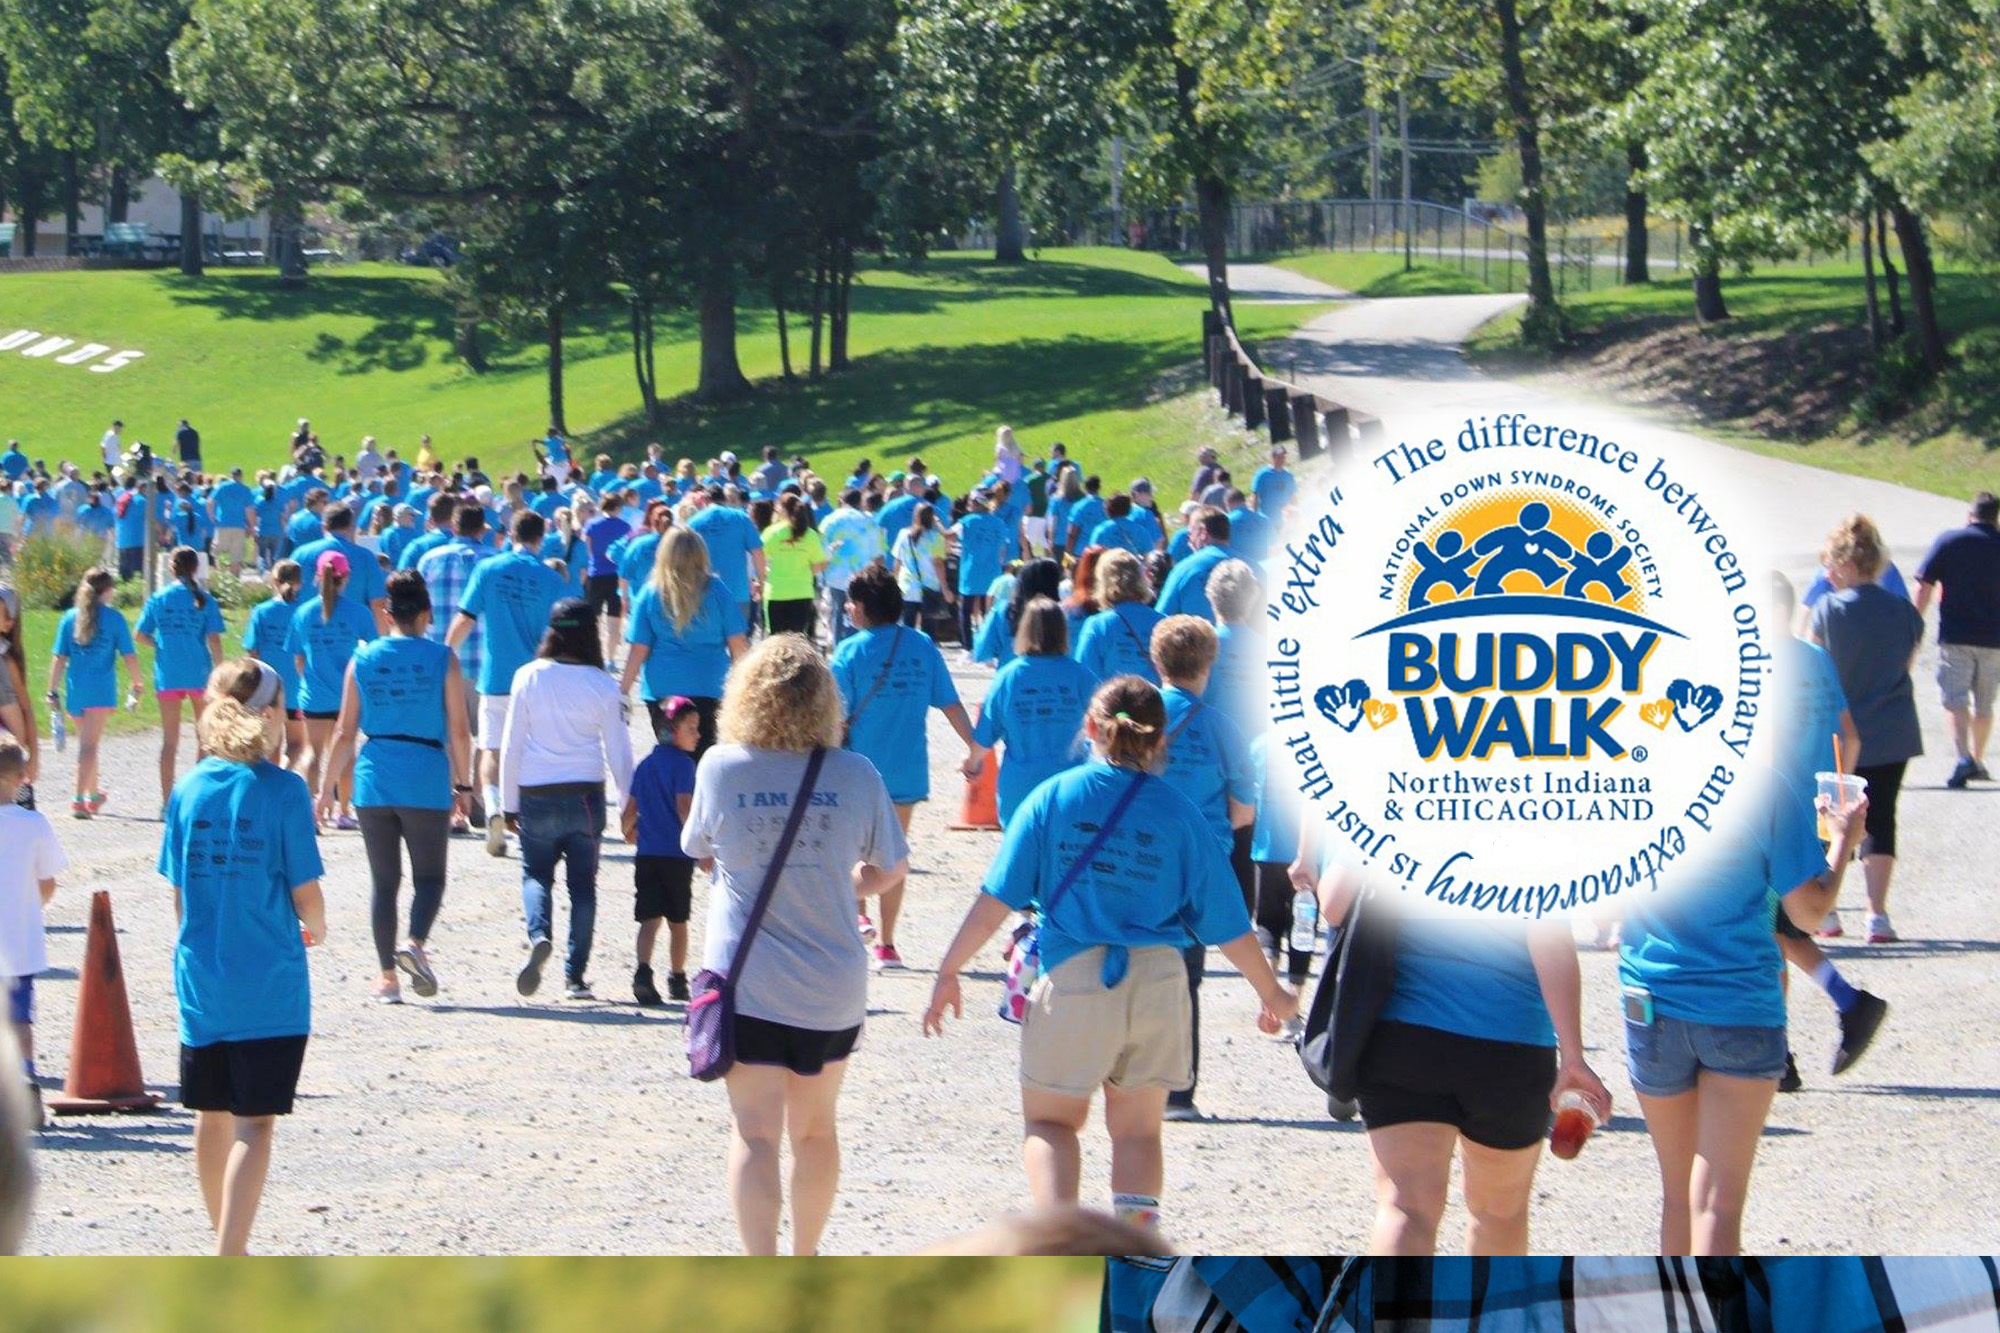 Buddy Walk Event Day (Volunteer Here!)